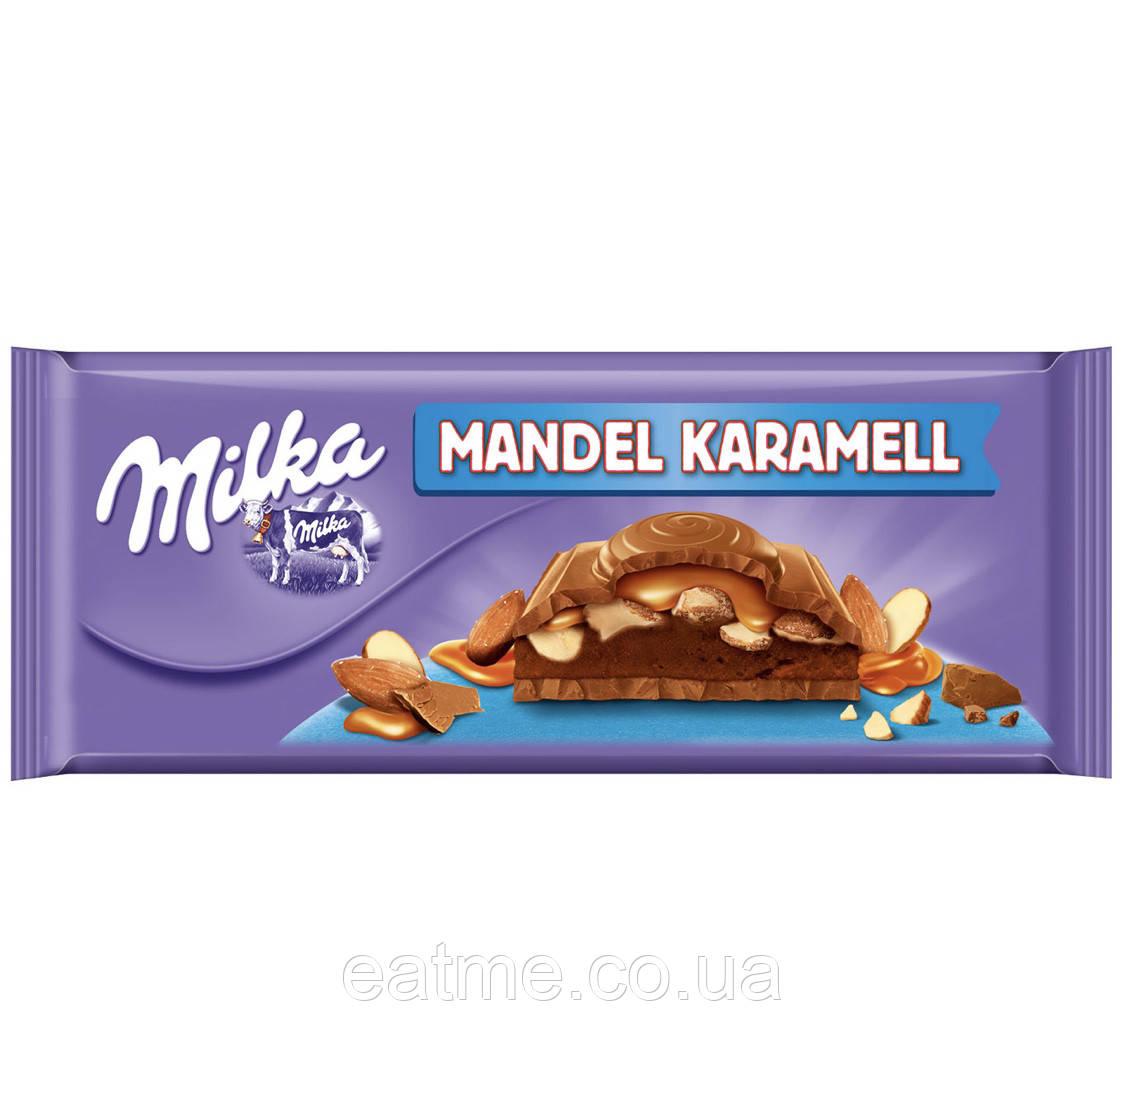 Milka Mandel Karamell Молочный шоколад с карамелью и миндалём